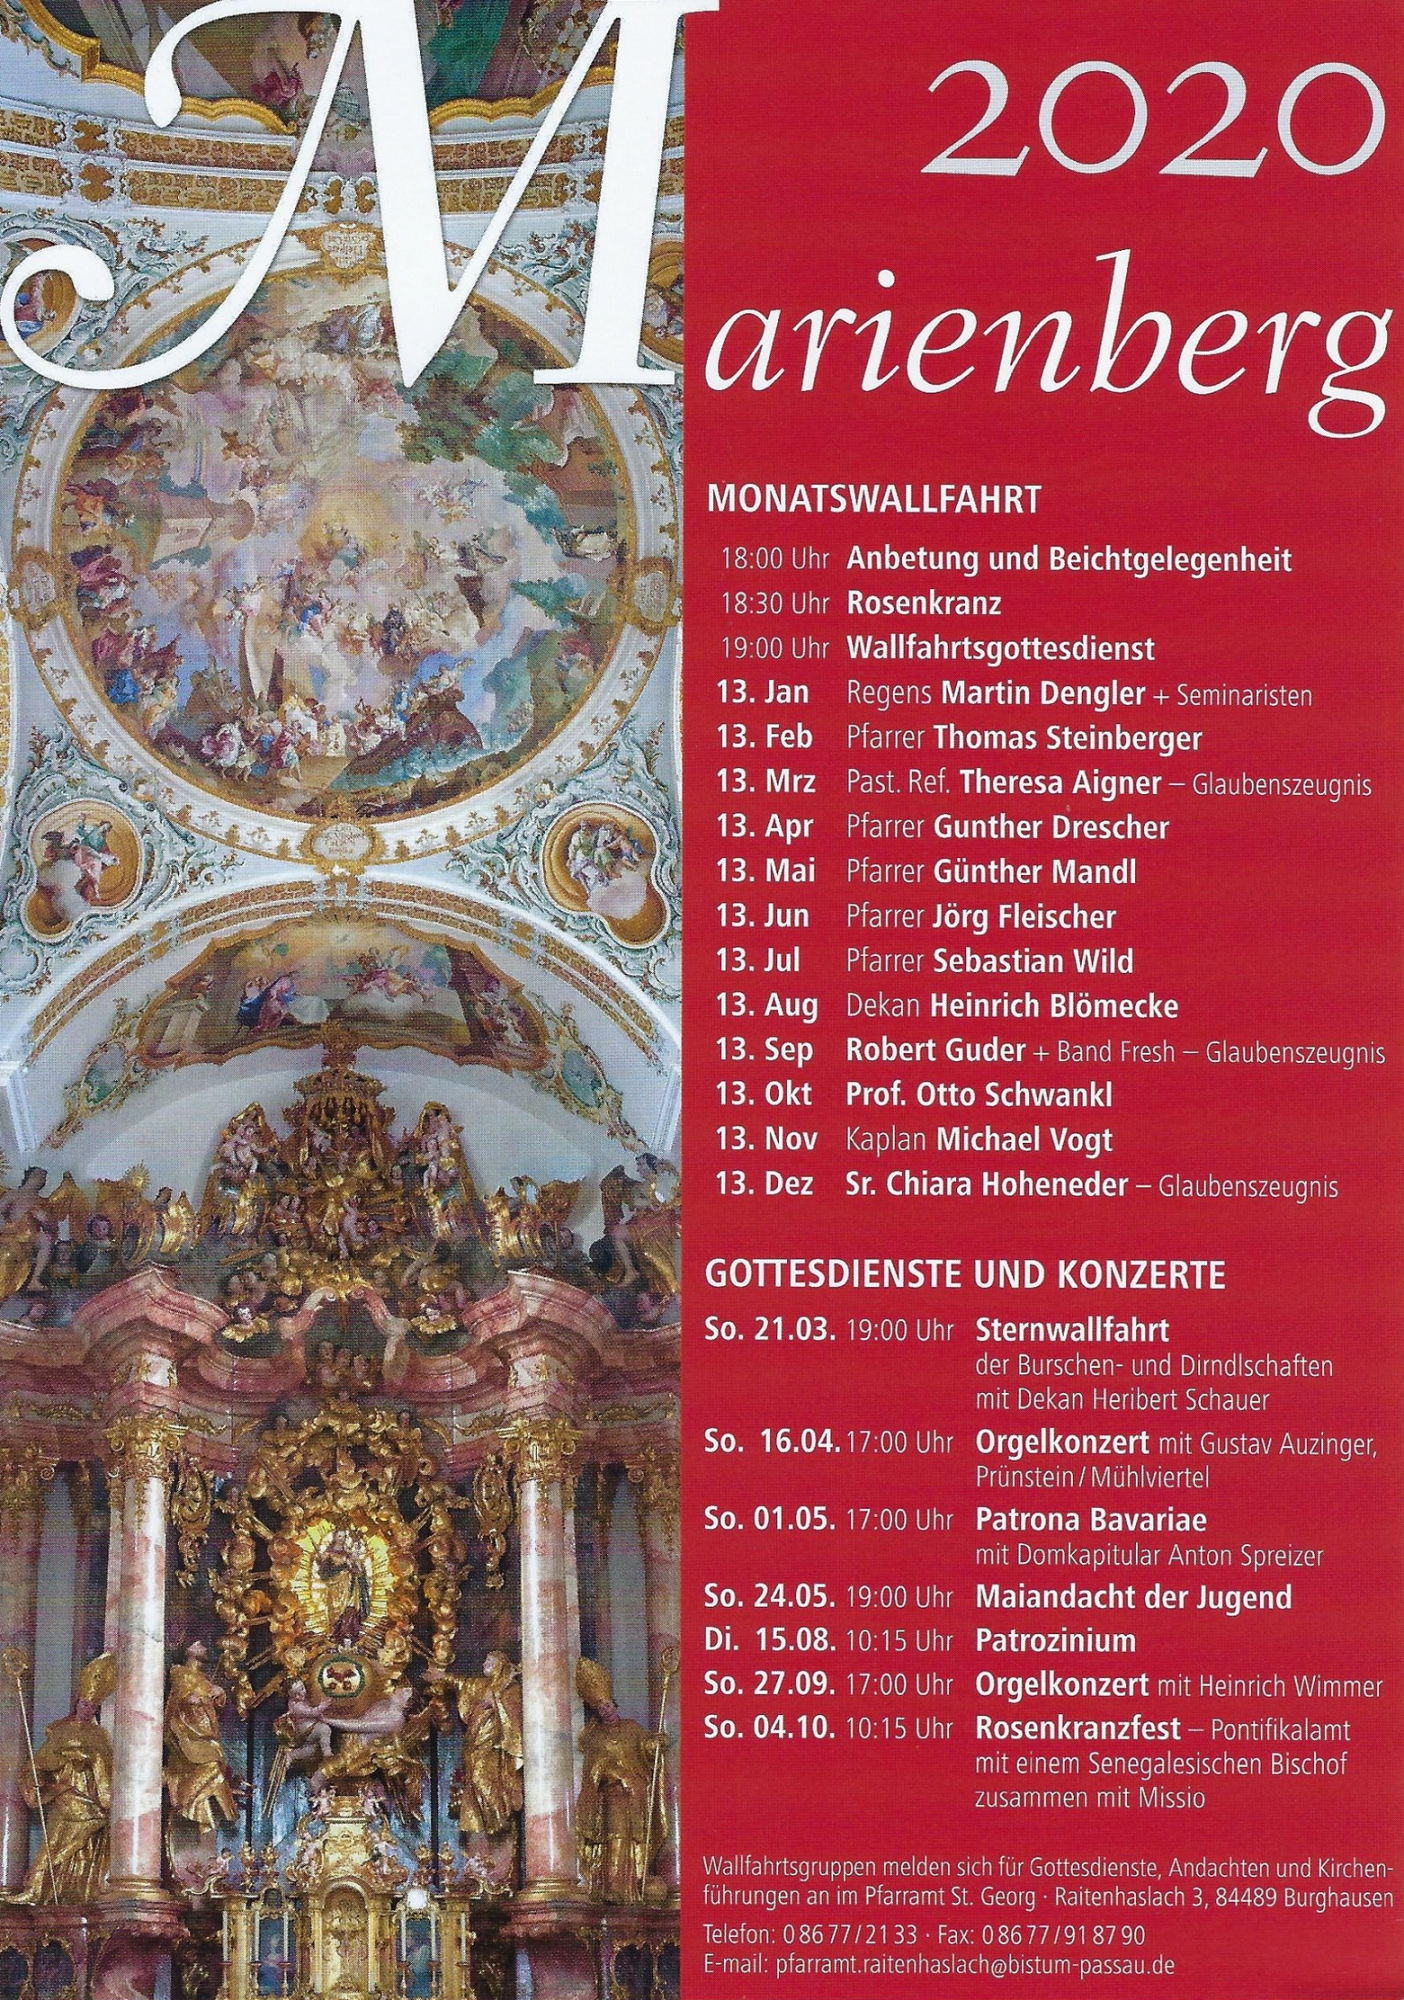 Marienberg 2020 2